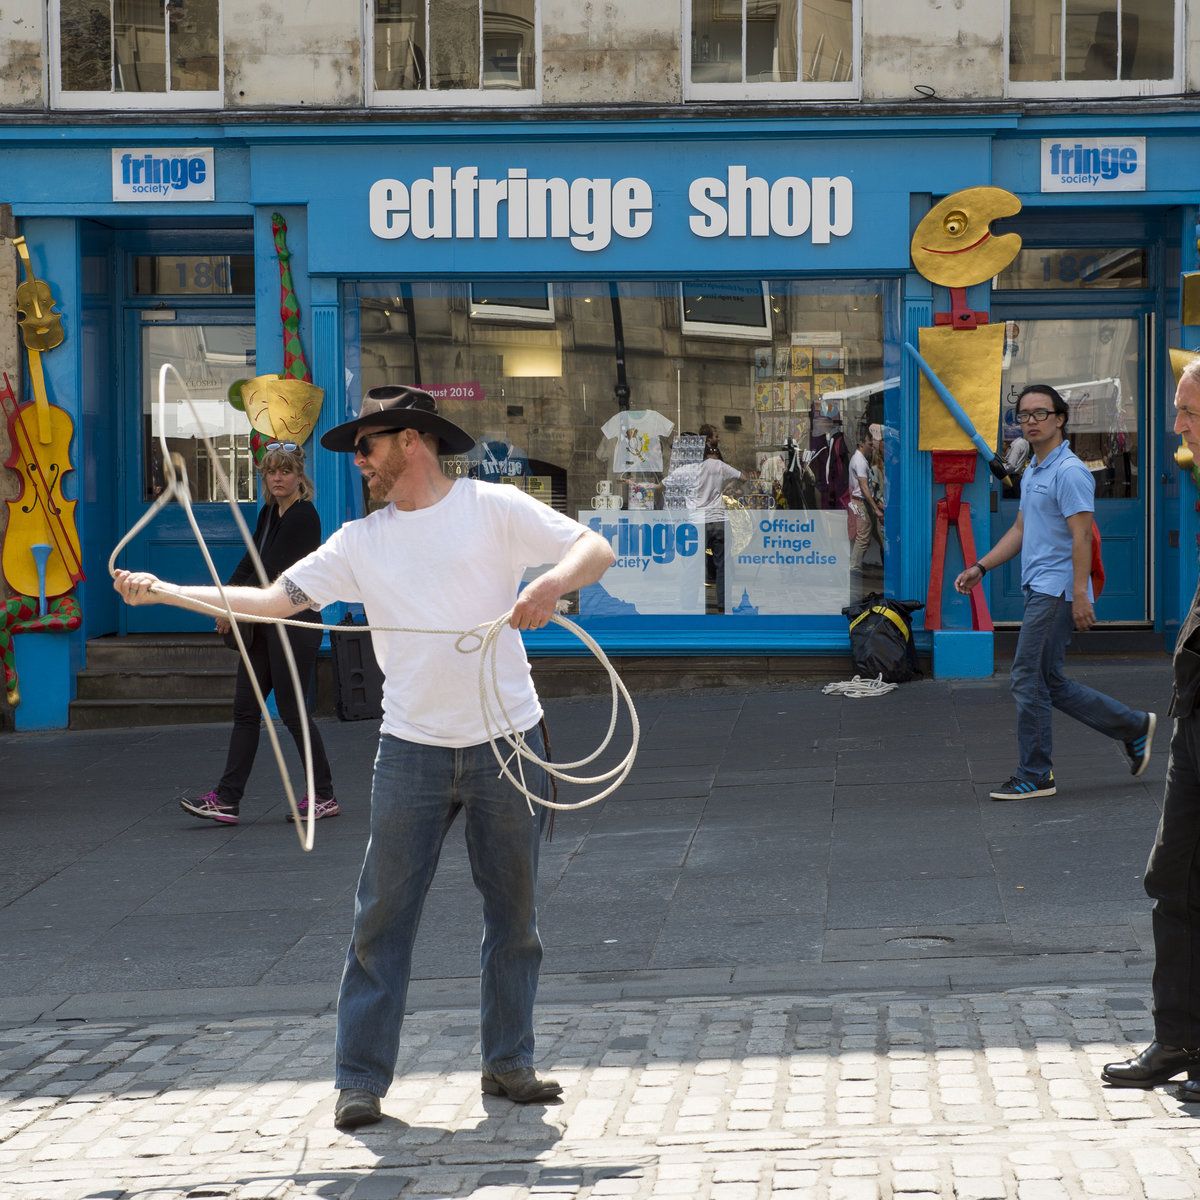 Edinburgh Tourist attractions - The High Strreet